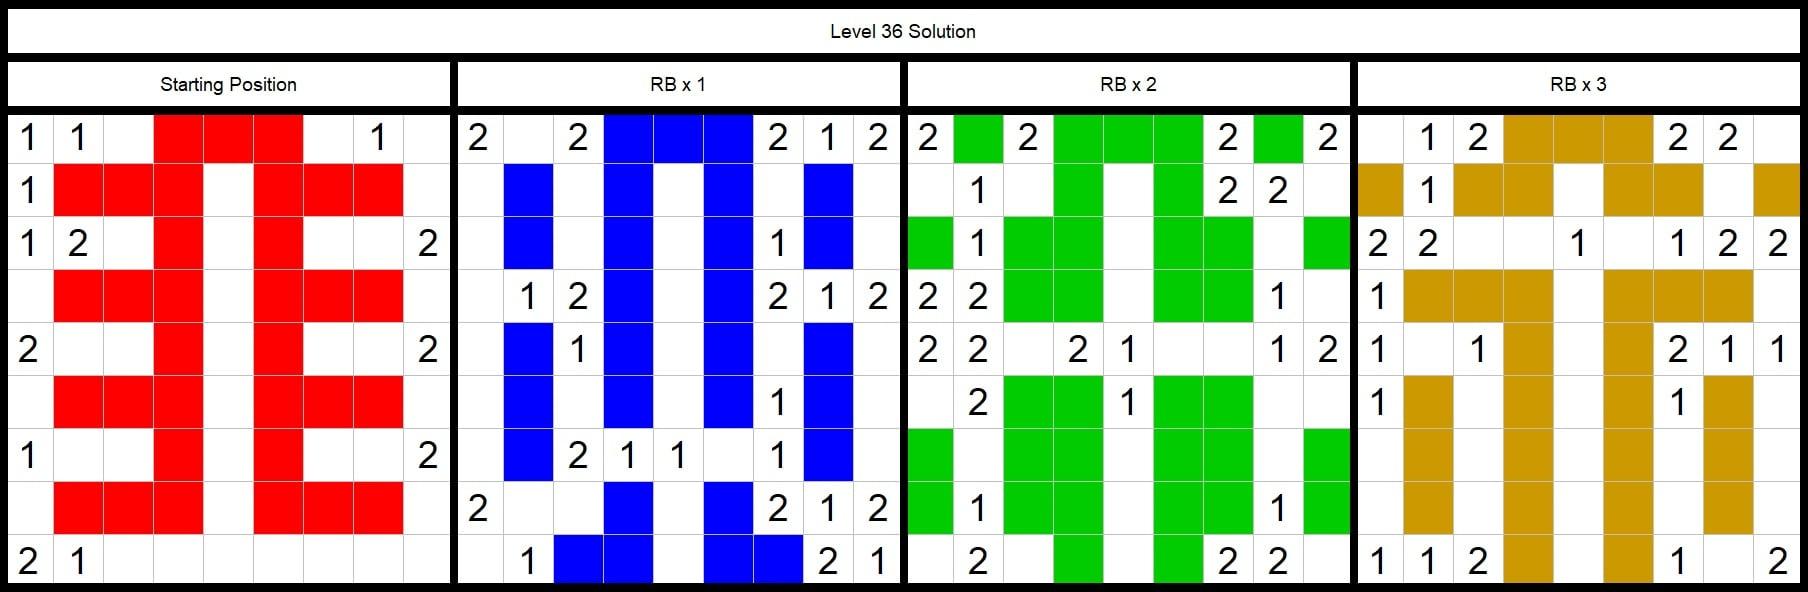 Level 36 Solution